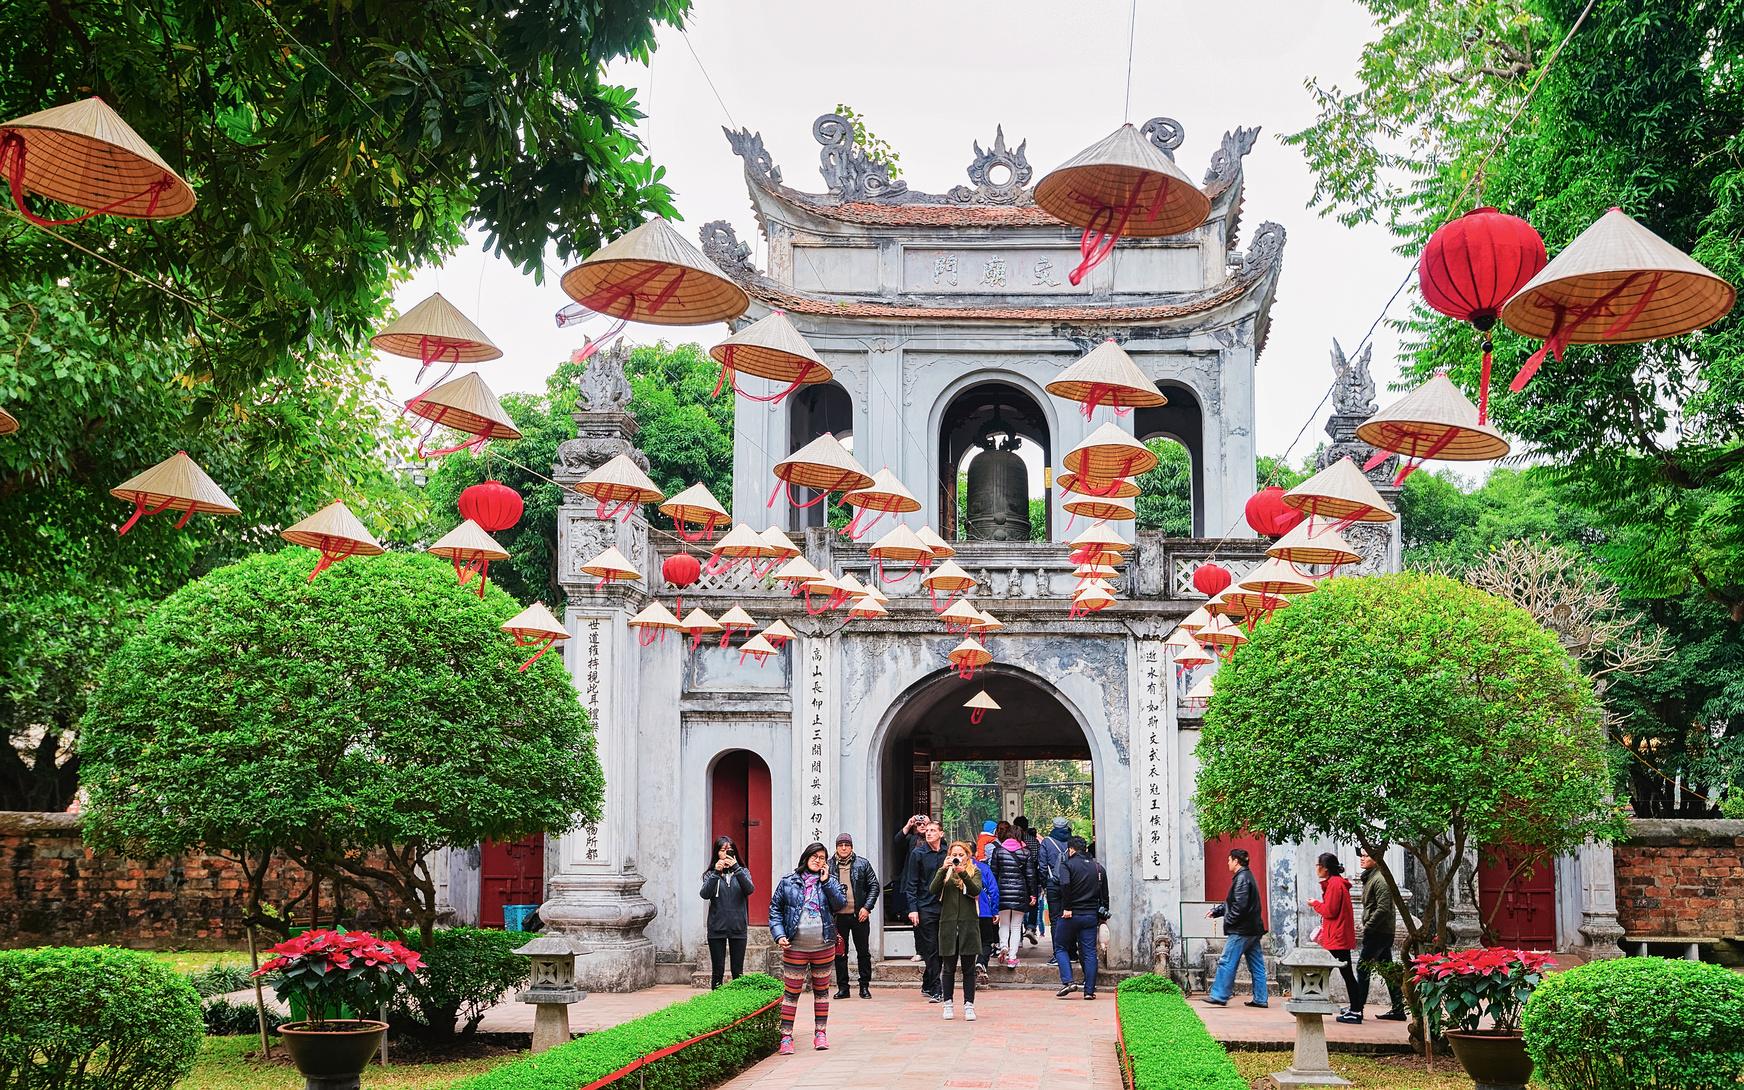 Świątynia Literatur Wietnam